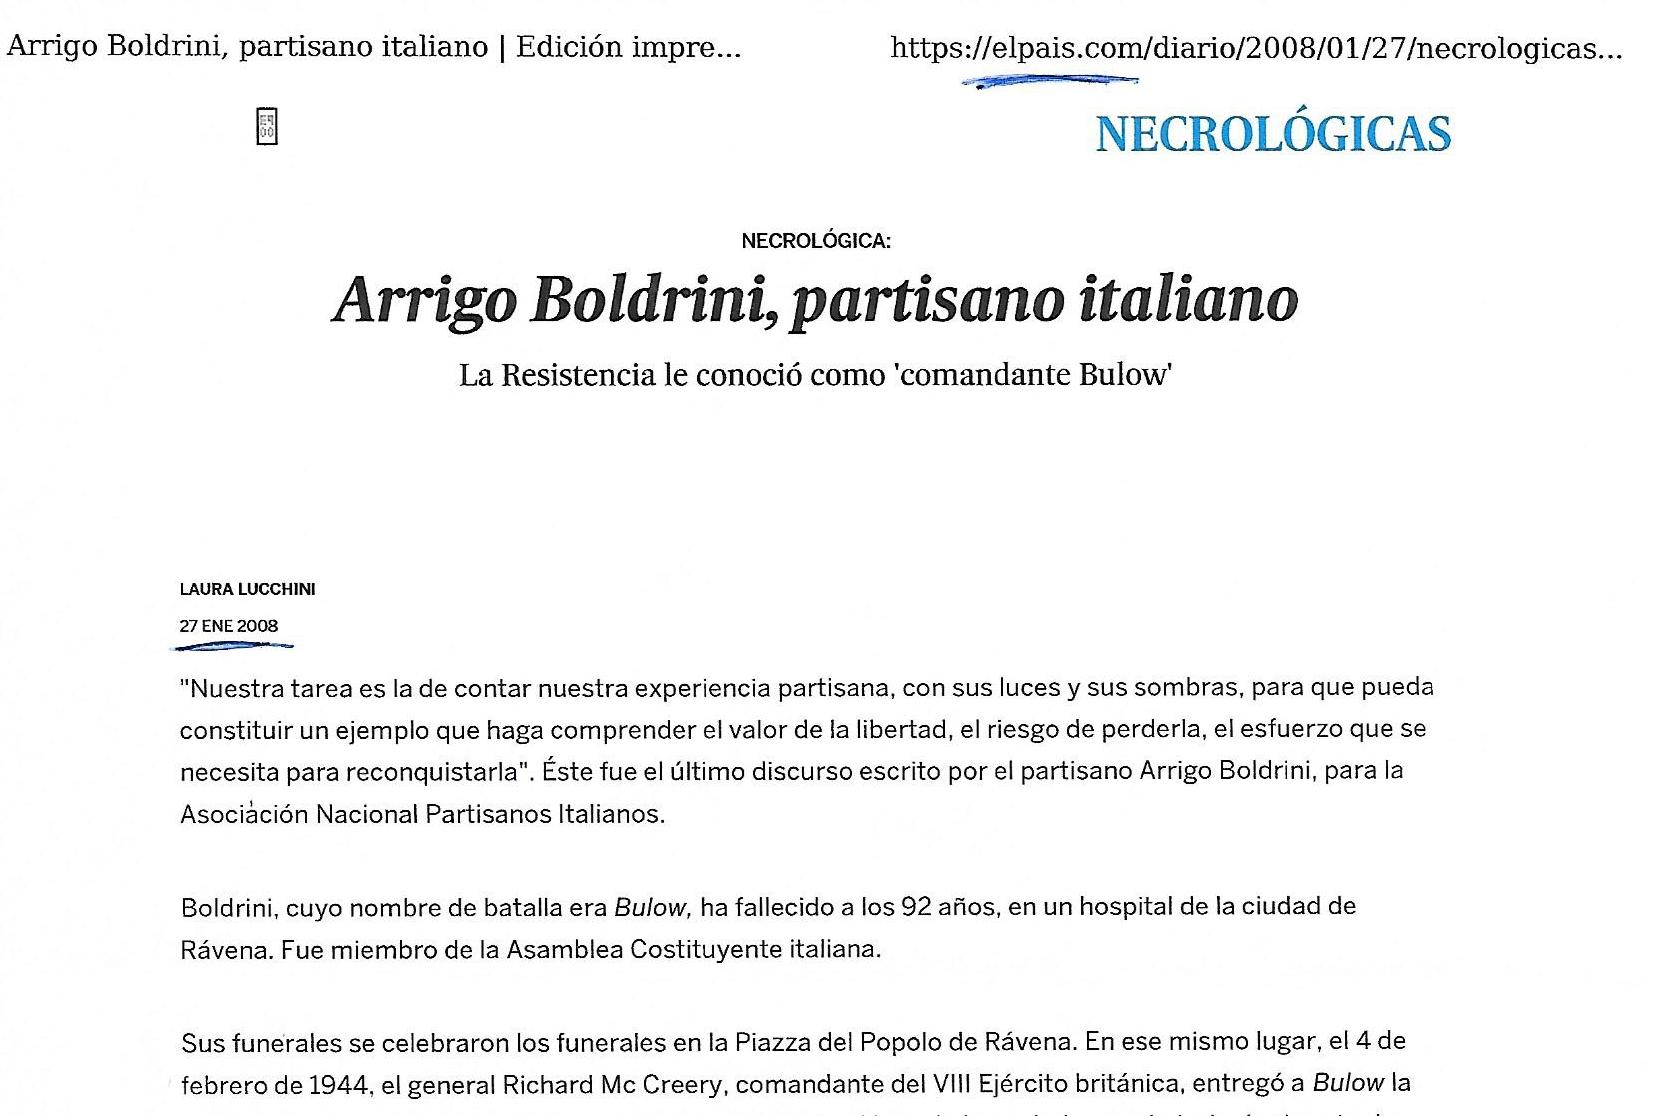 Articolo de El Pais, necrologio Boldrini 2008 (1)